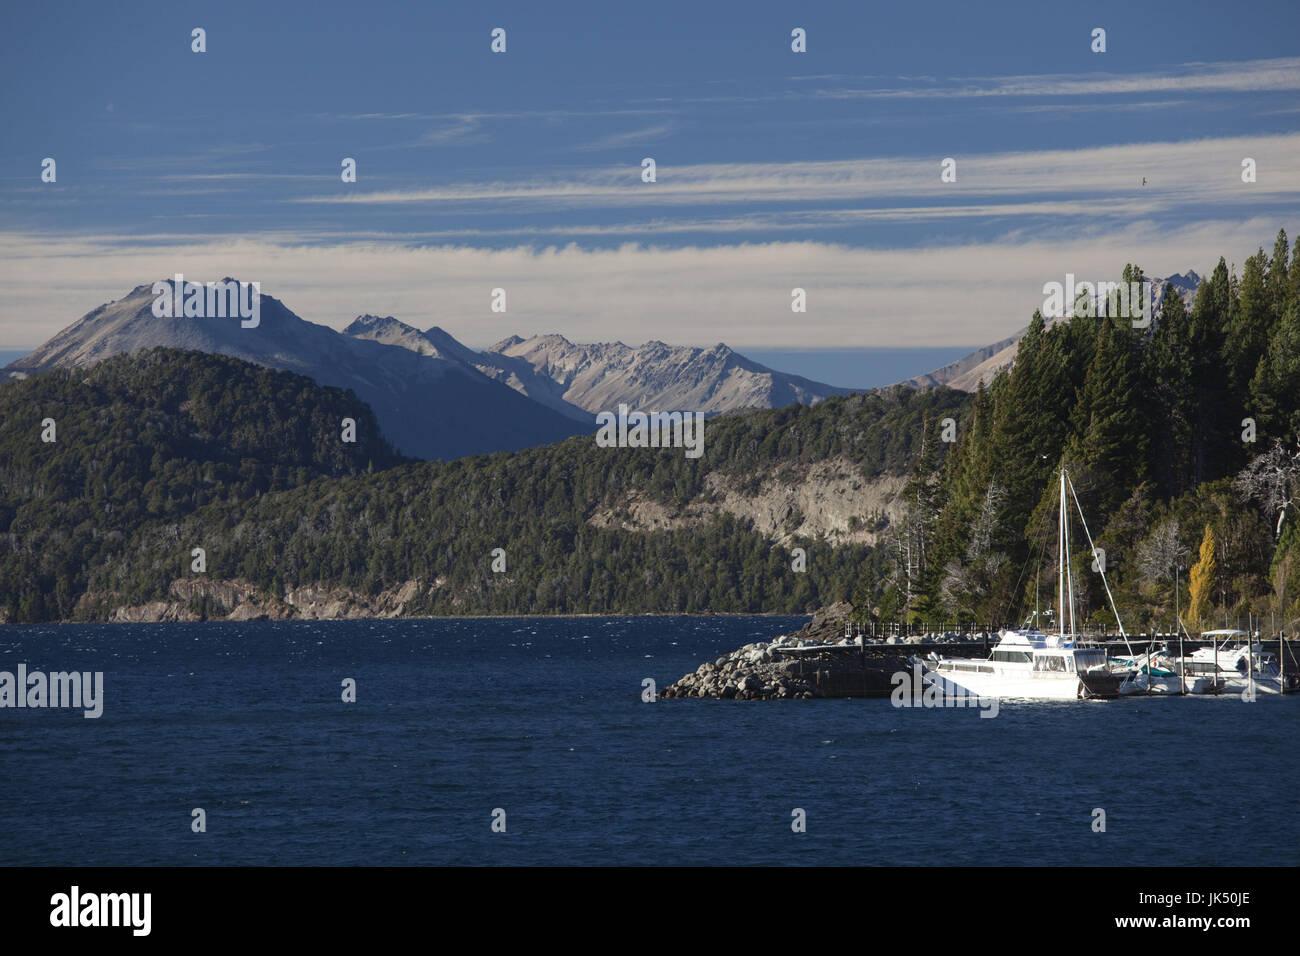 Argentina, Rio Negro Province, Lake District, Llao Llao, Lake Nahuel Huapi - Stock Image